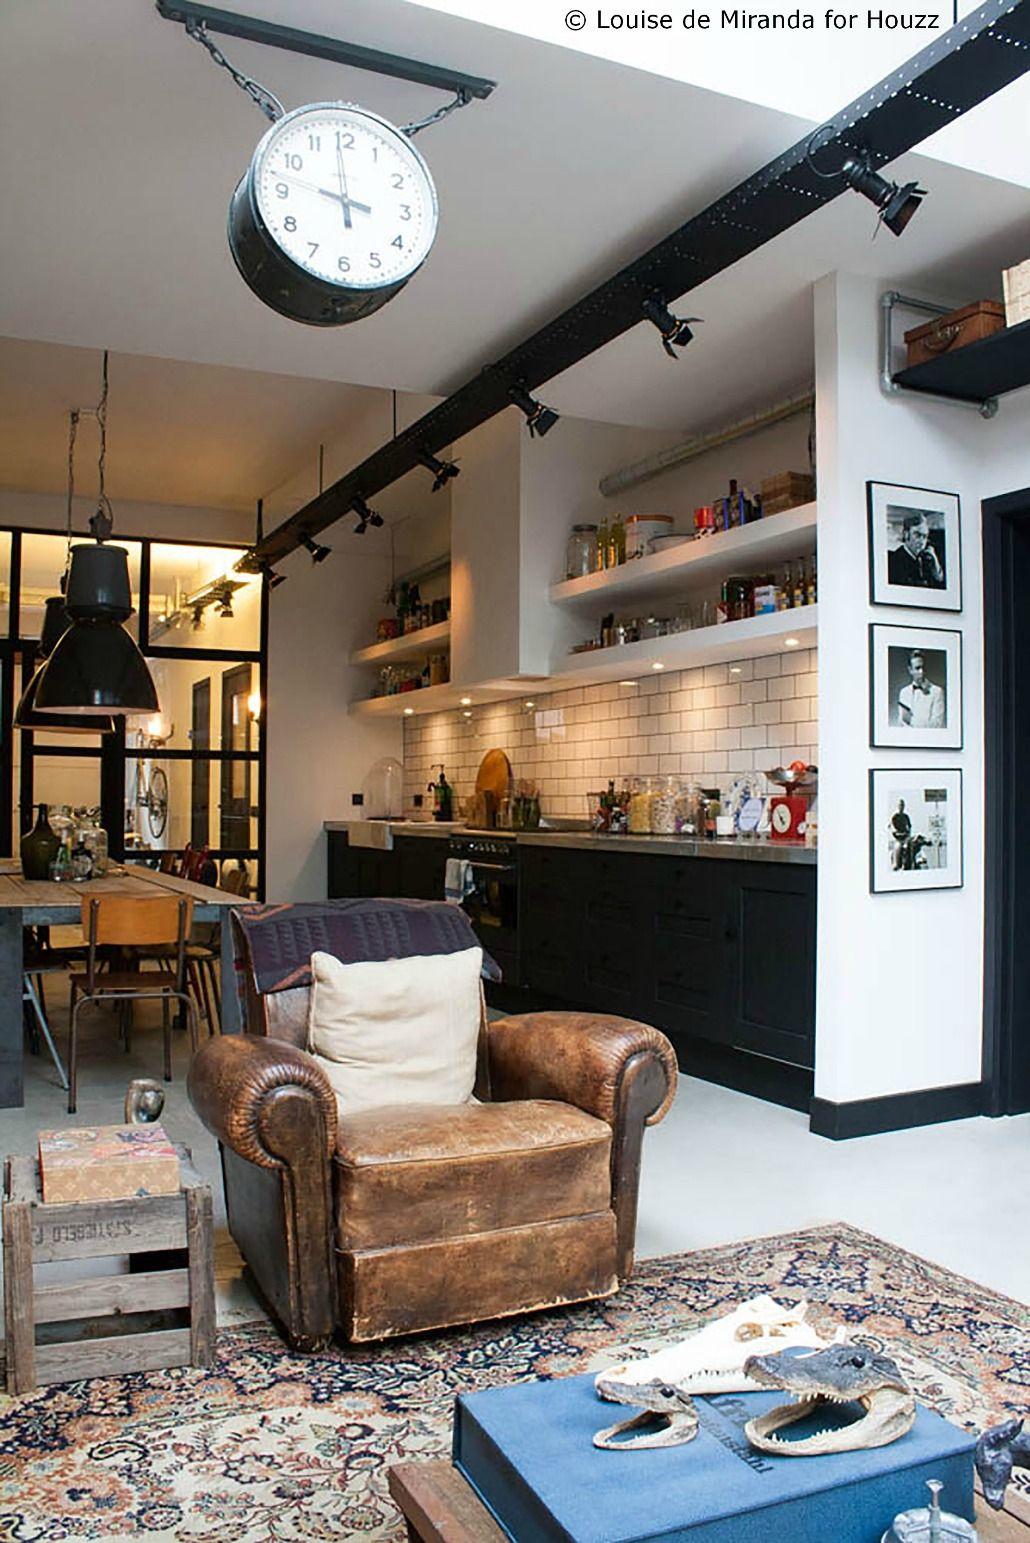 21 most beautiful industrial kitchen designs | industrial kitchens